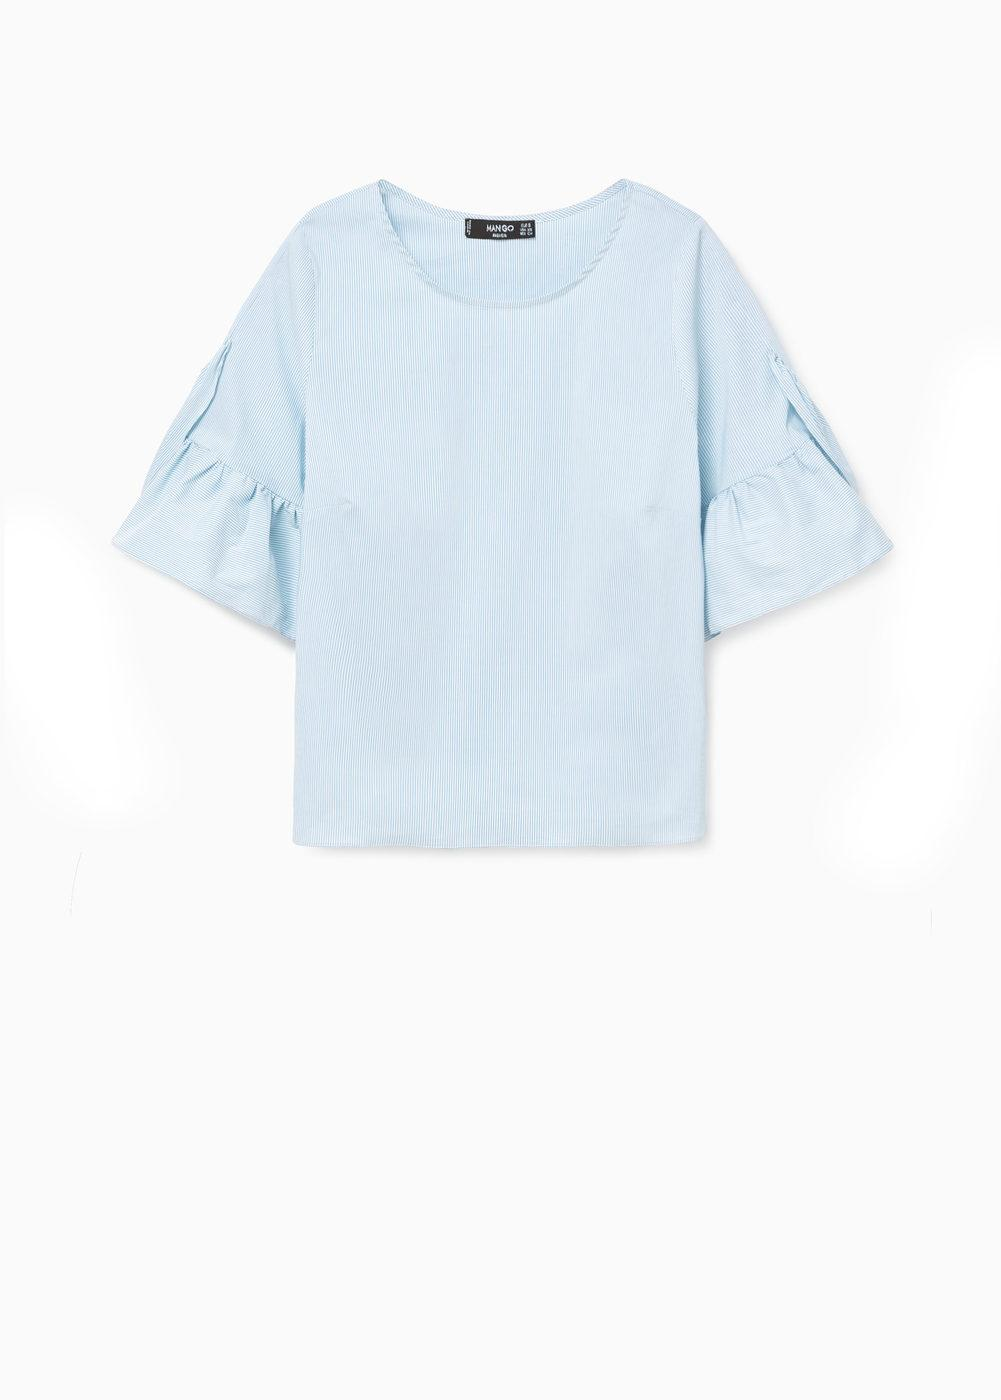 Ruffle Sleeve Baby Blue Top